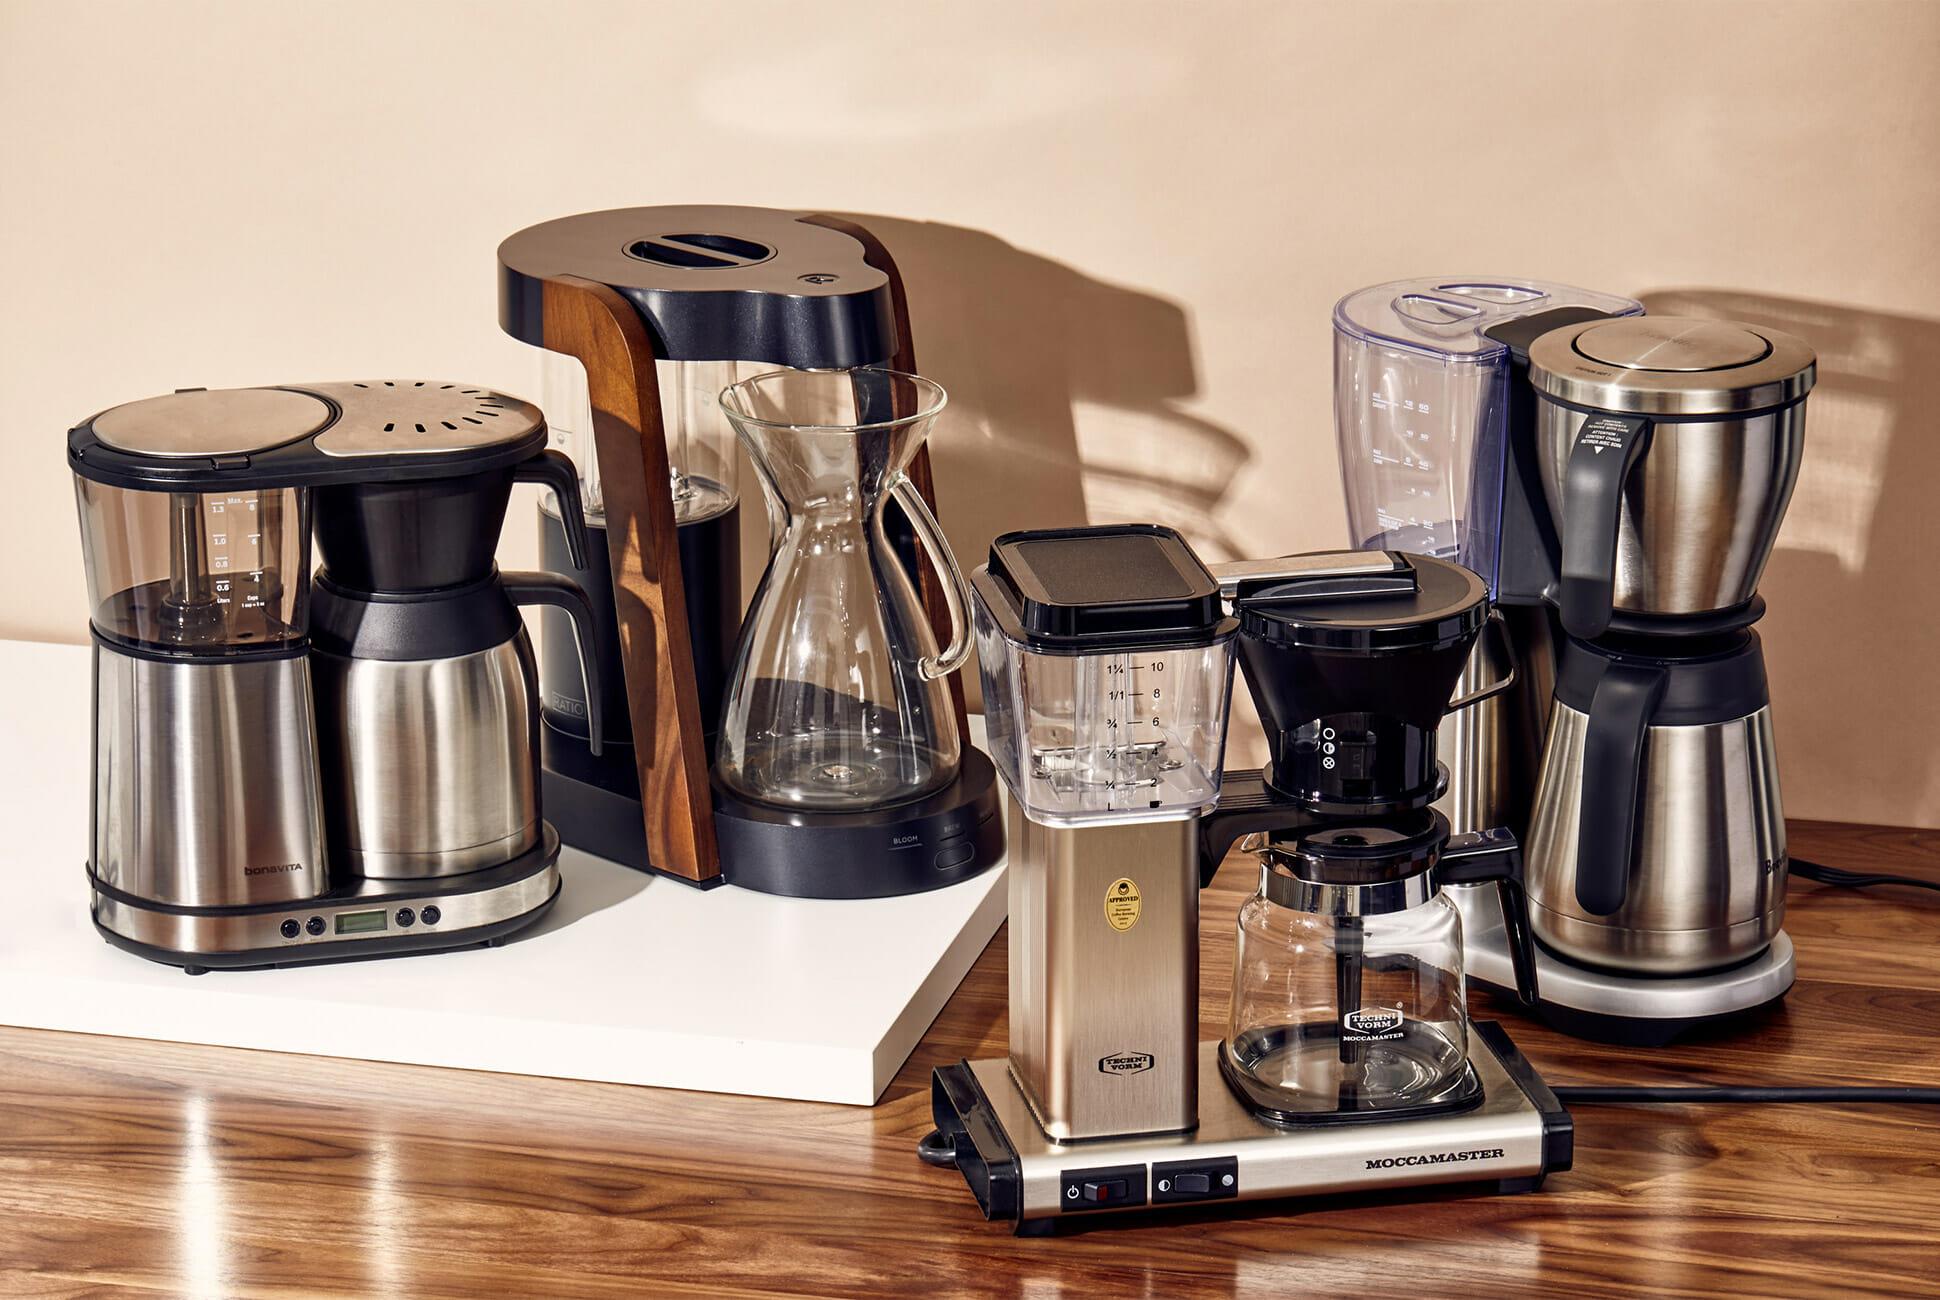 Best Coffee Maker or Espresso Machine Listing & Buyer's Guide